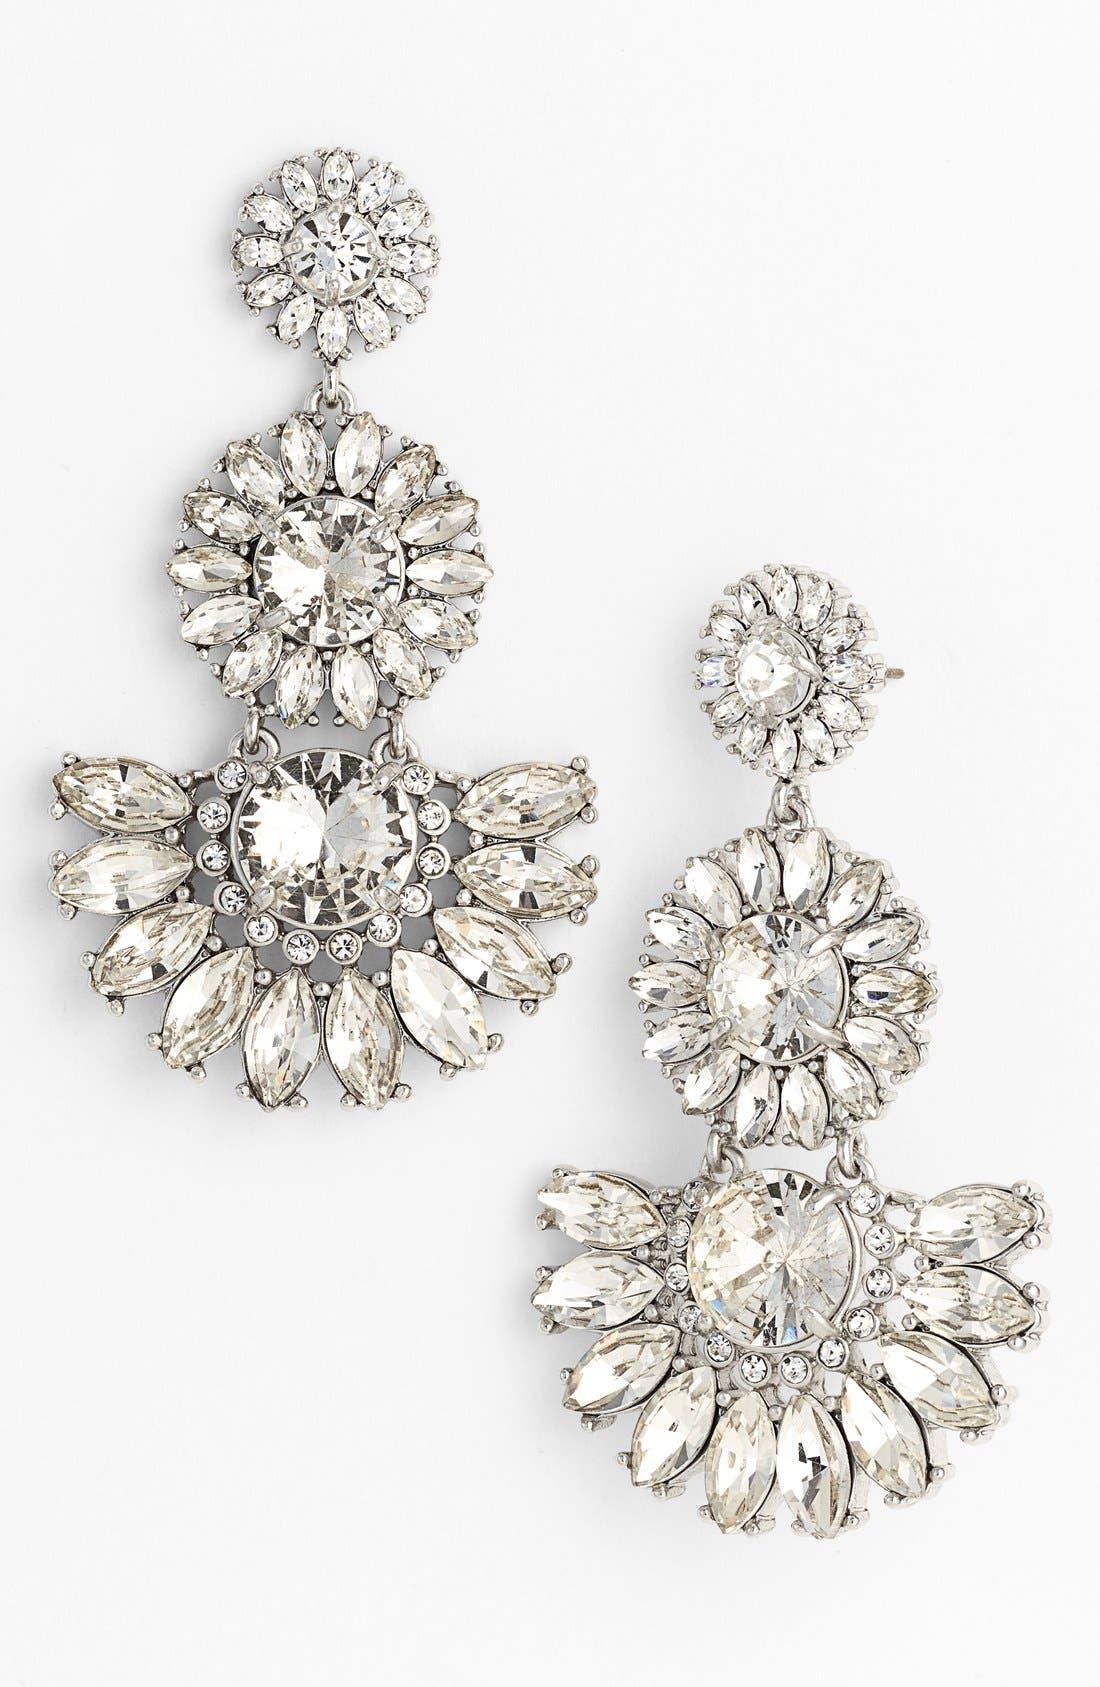 Alternate Image 1 Selected - kate spade new york 'estate garden' crystal drop earrings